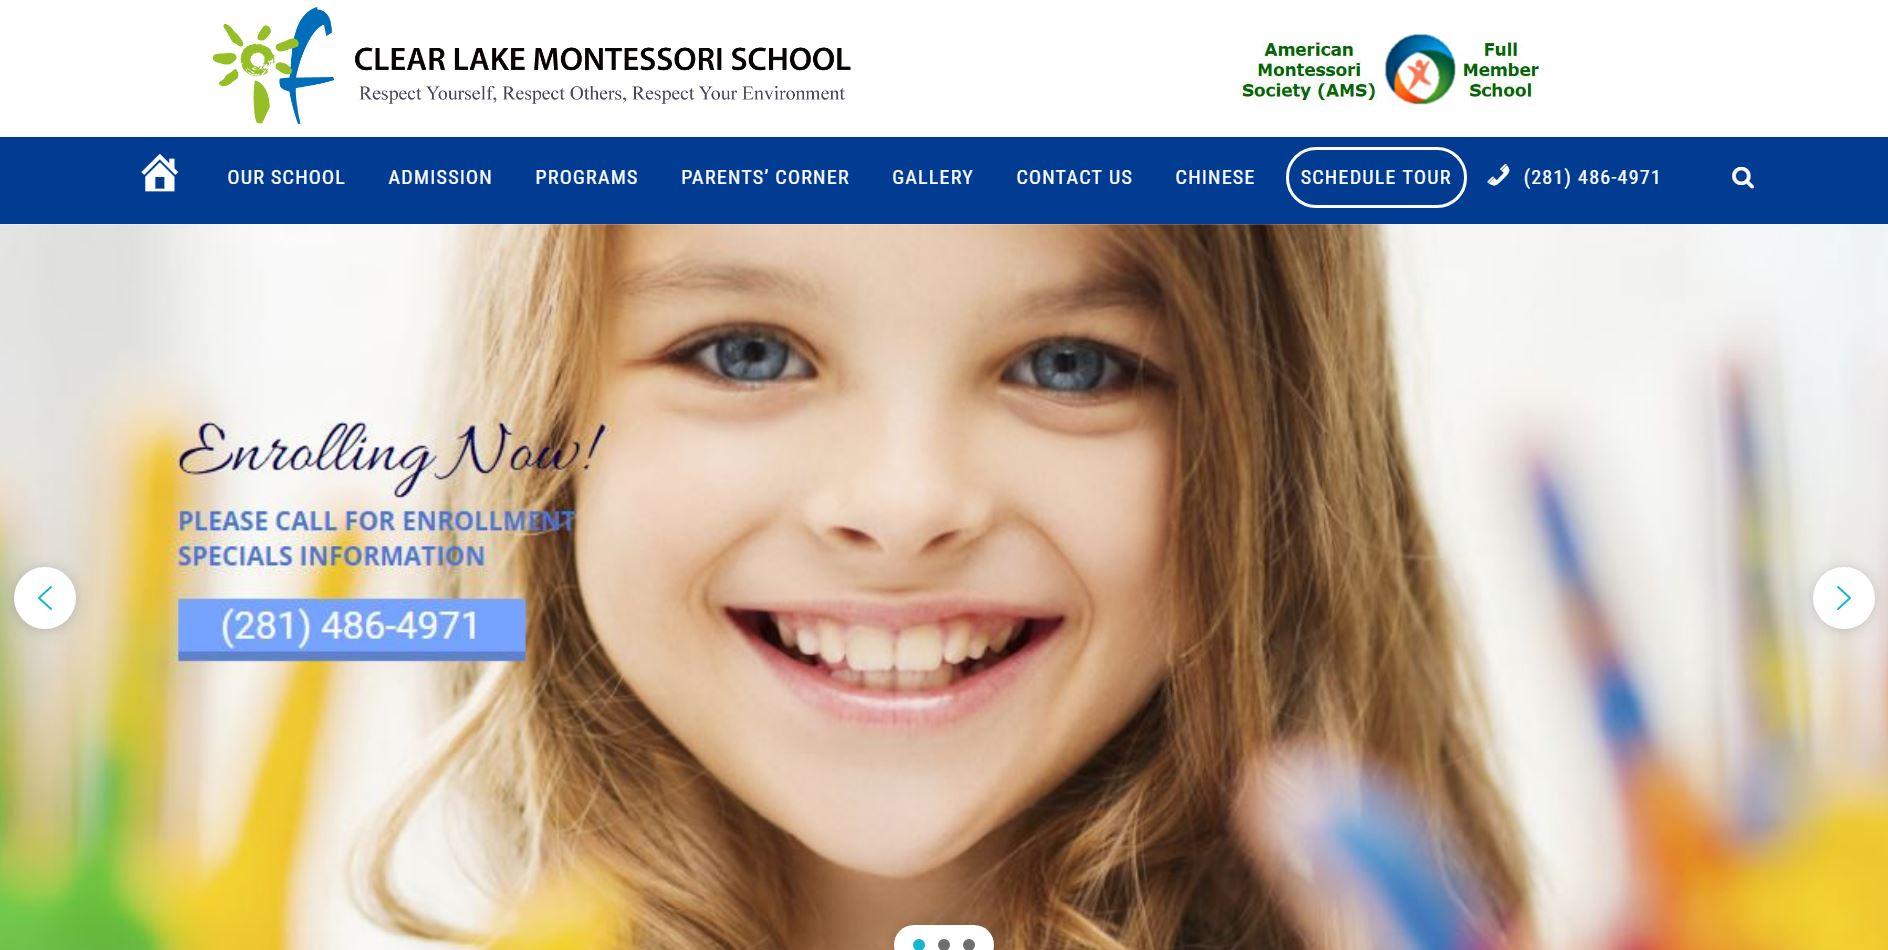 www.clearlakemontessori.com